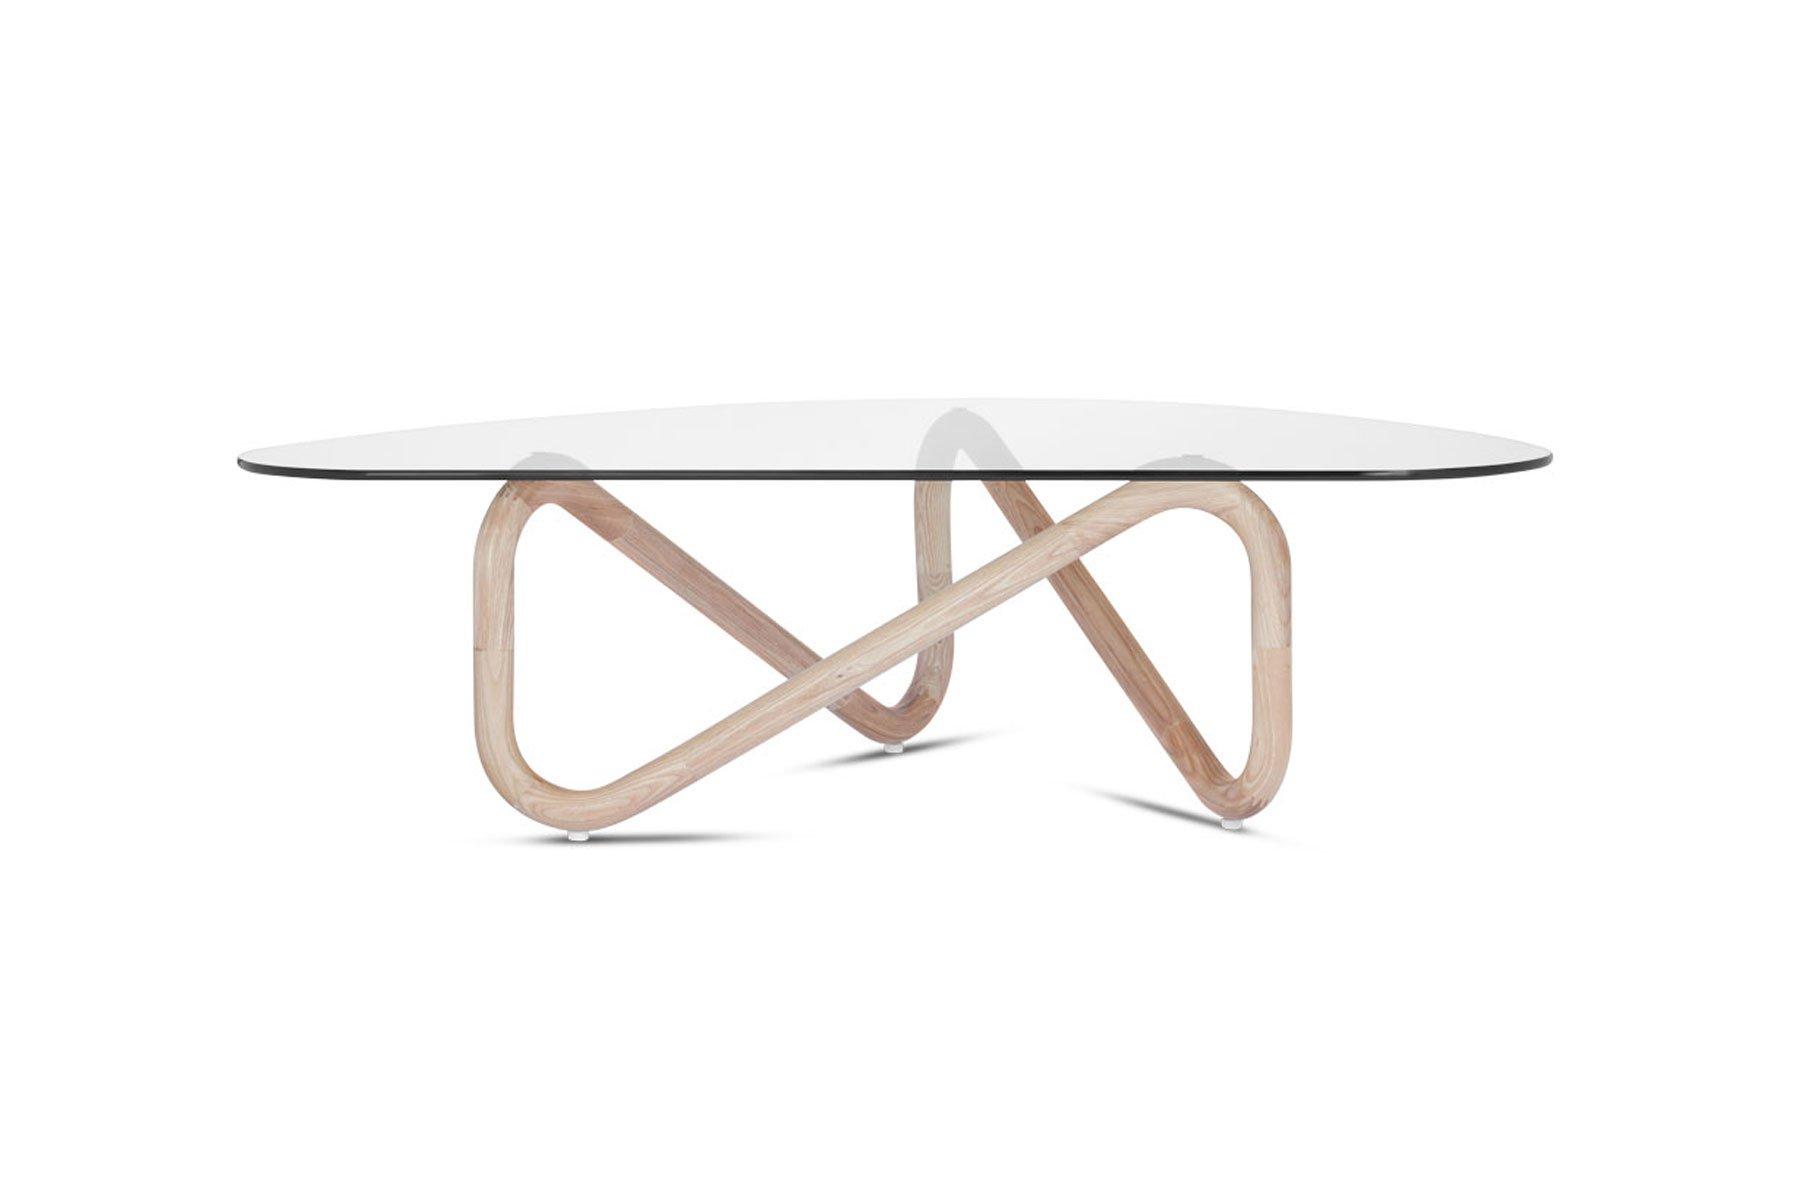 CATALANO-SKU-IOT10TP900-SPIRAL-COFFEE-TABLE-ASH-GLASS2113